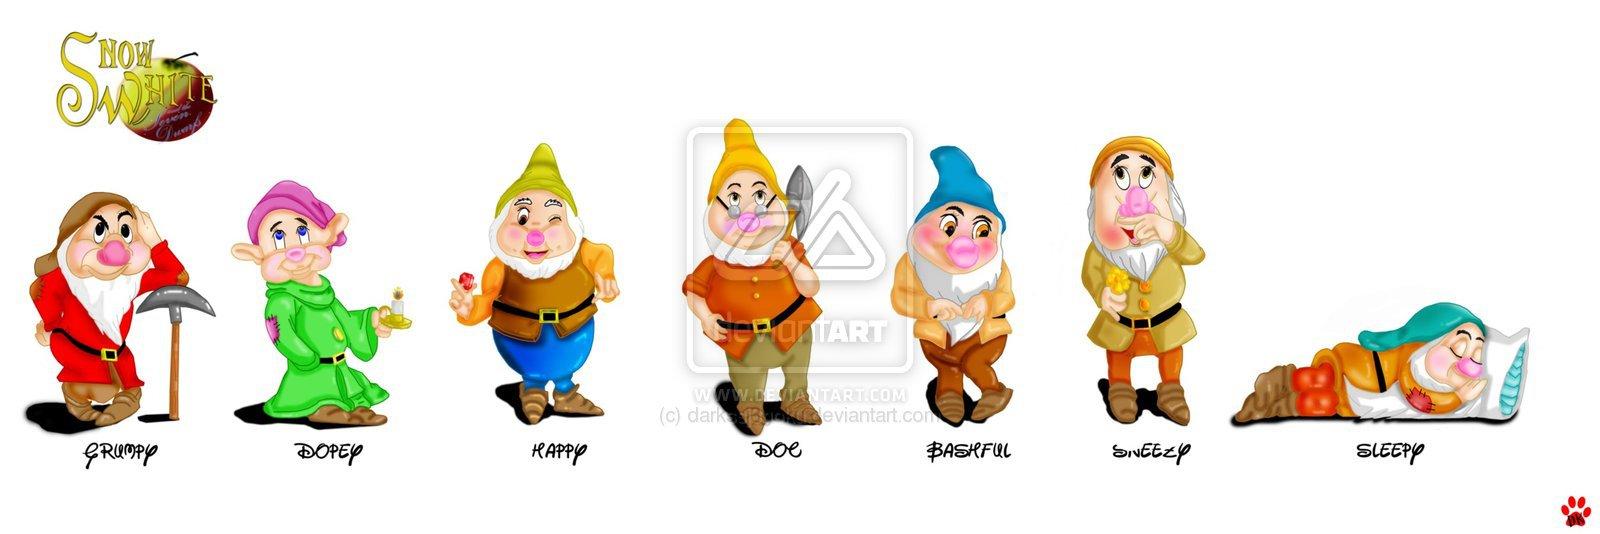 7 dwarfs names in order - Free Disney Cartoon